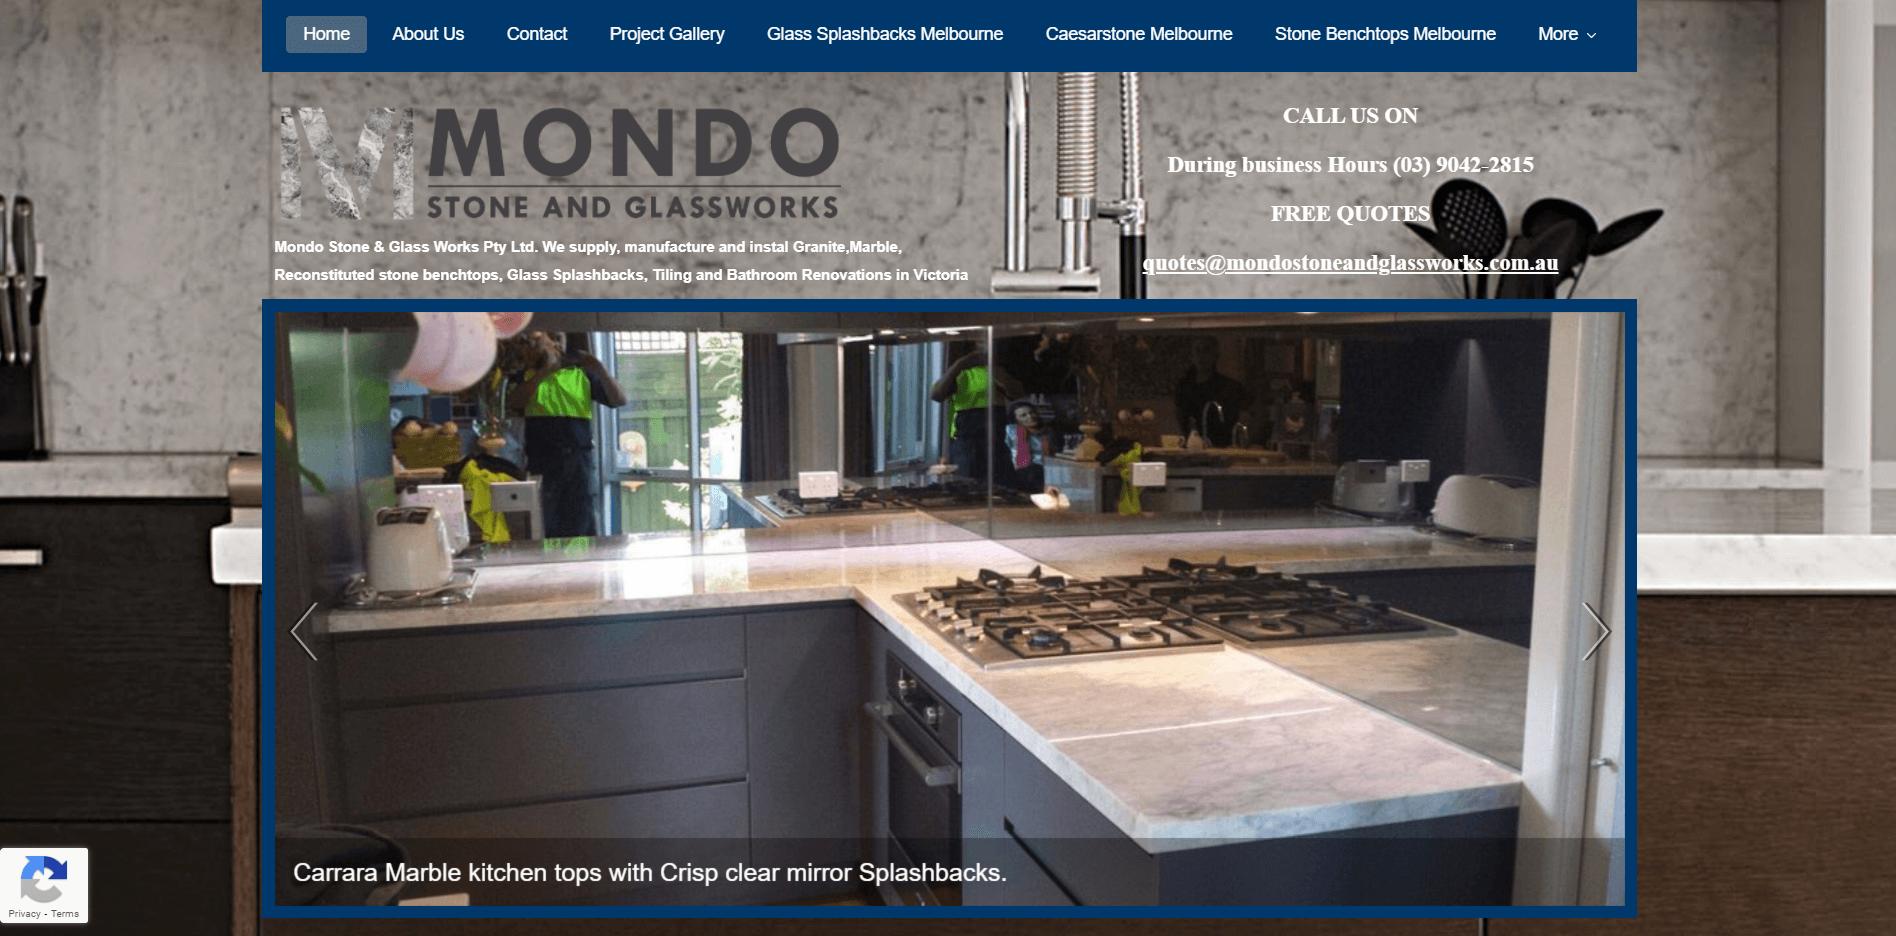 Mondo Stone & Glass